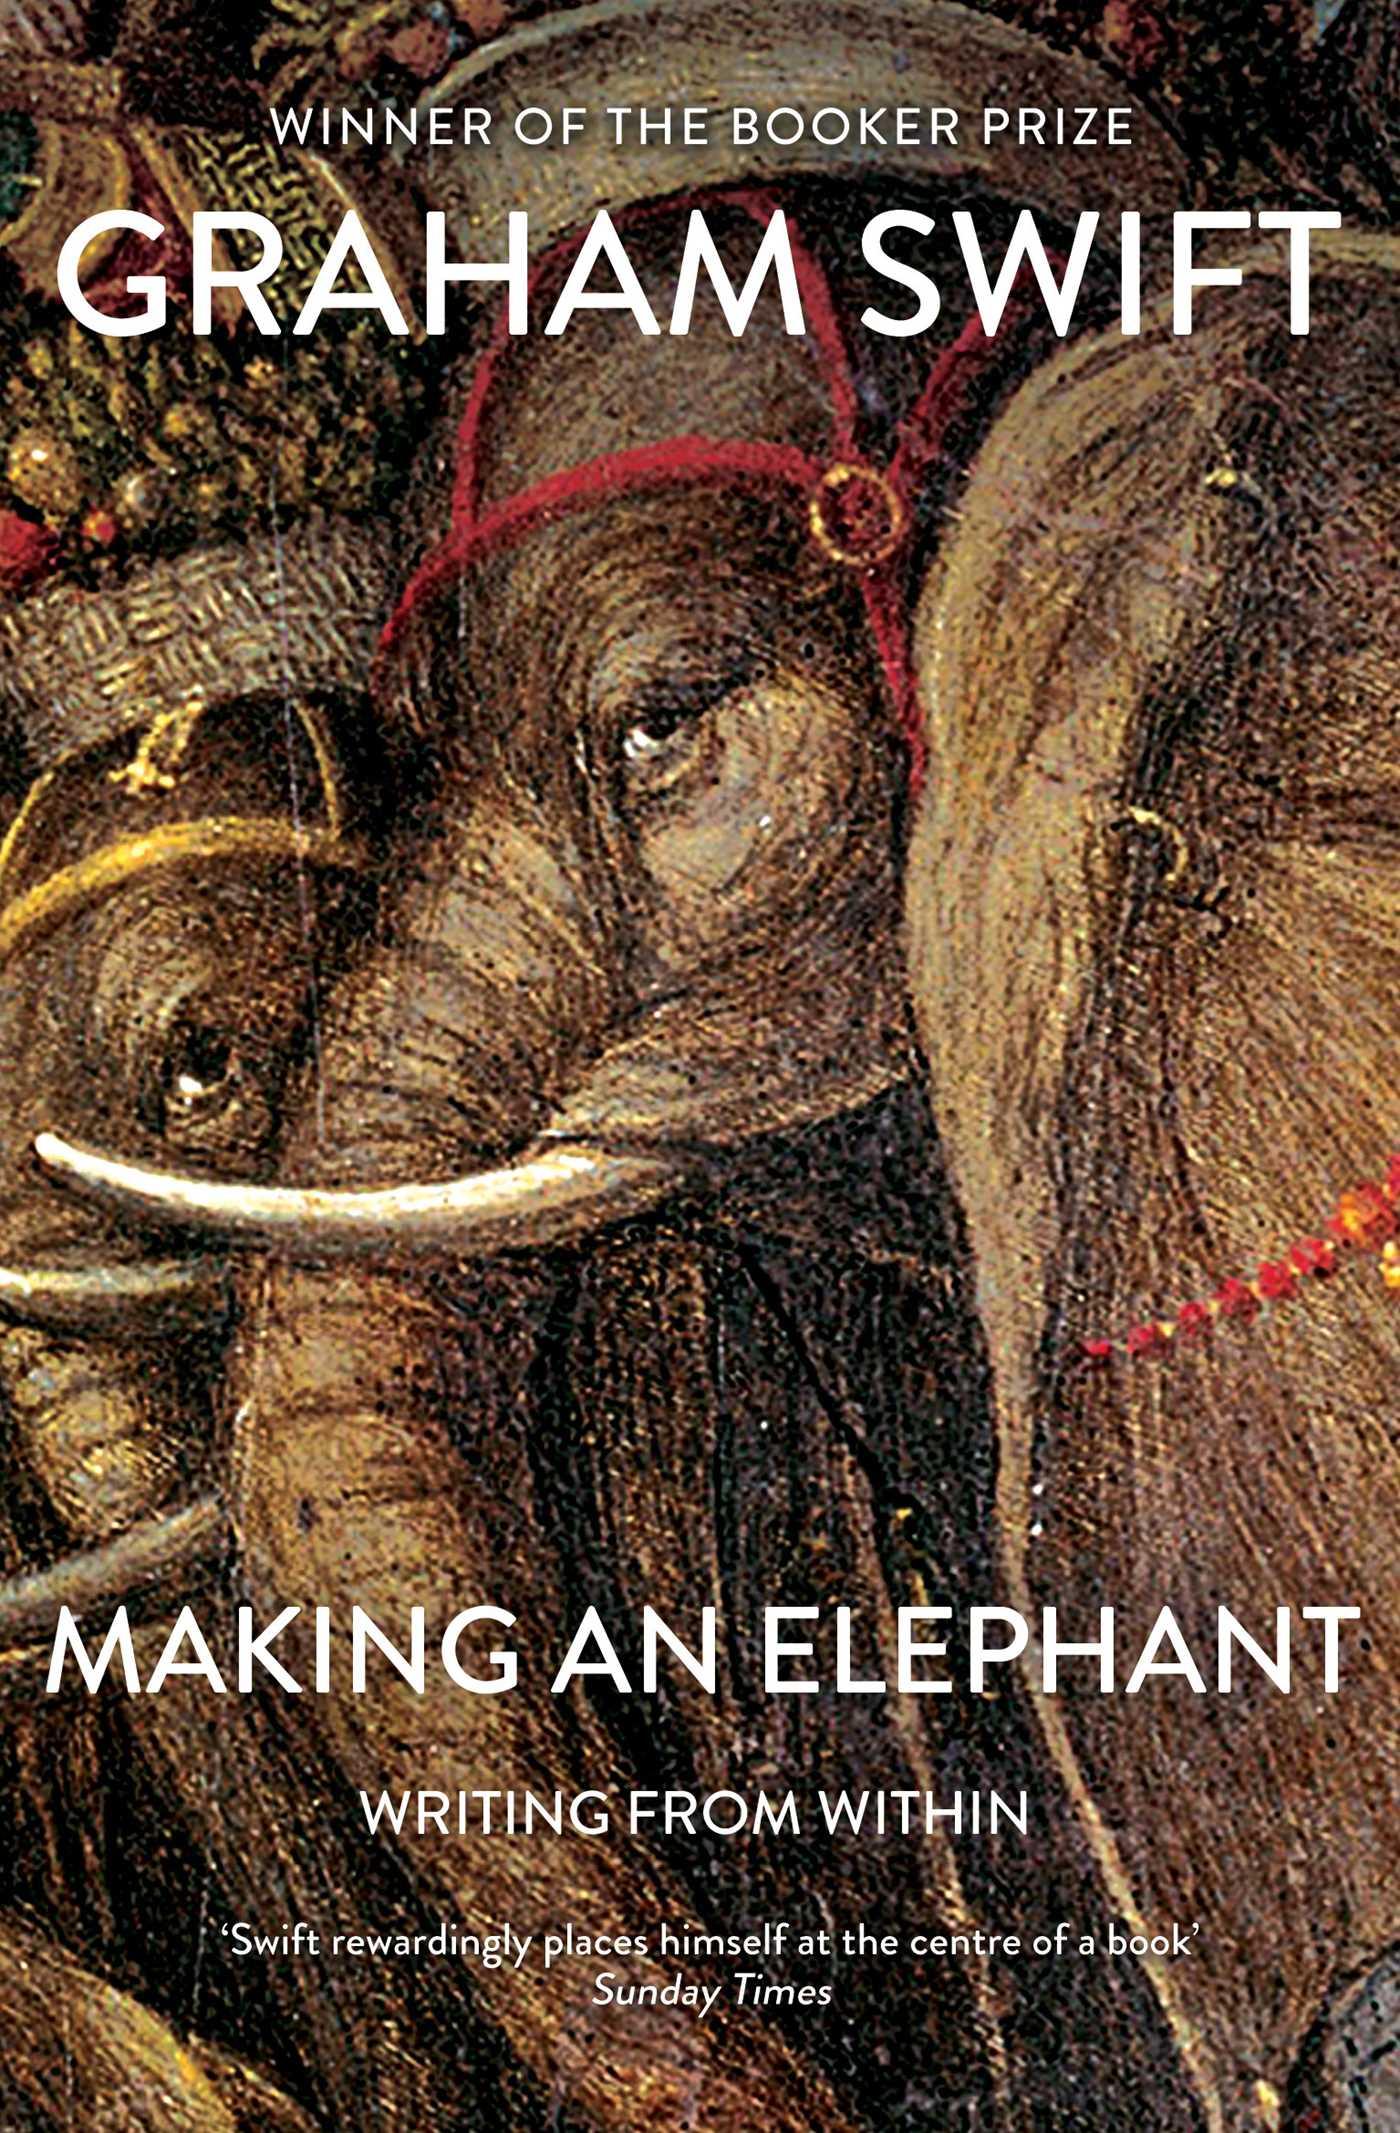 Making an elephant 9781471161940 hr